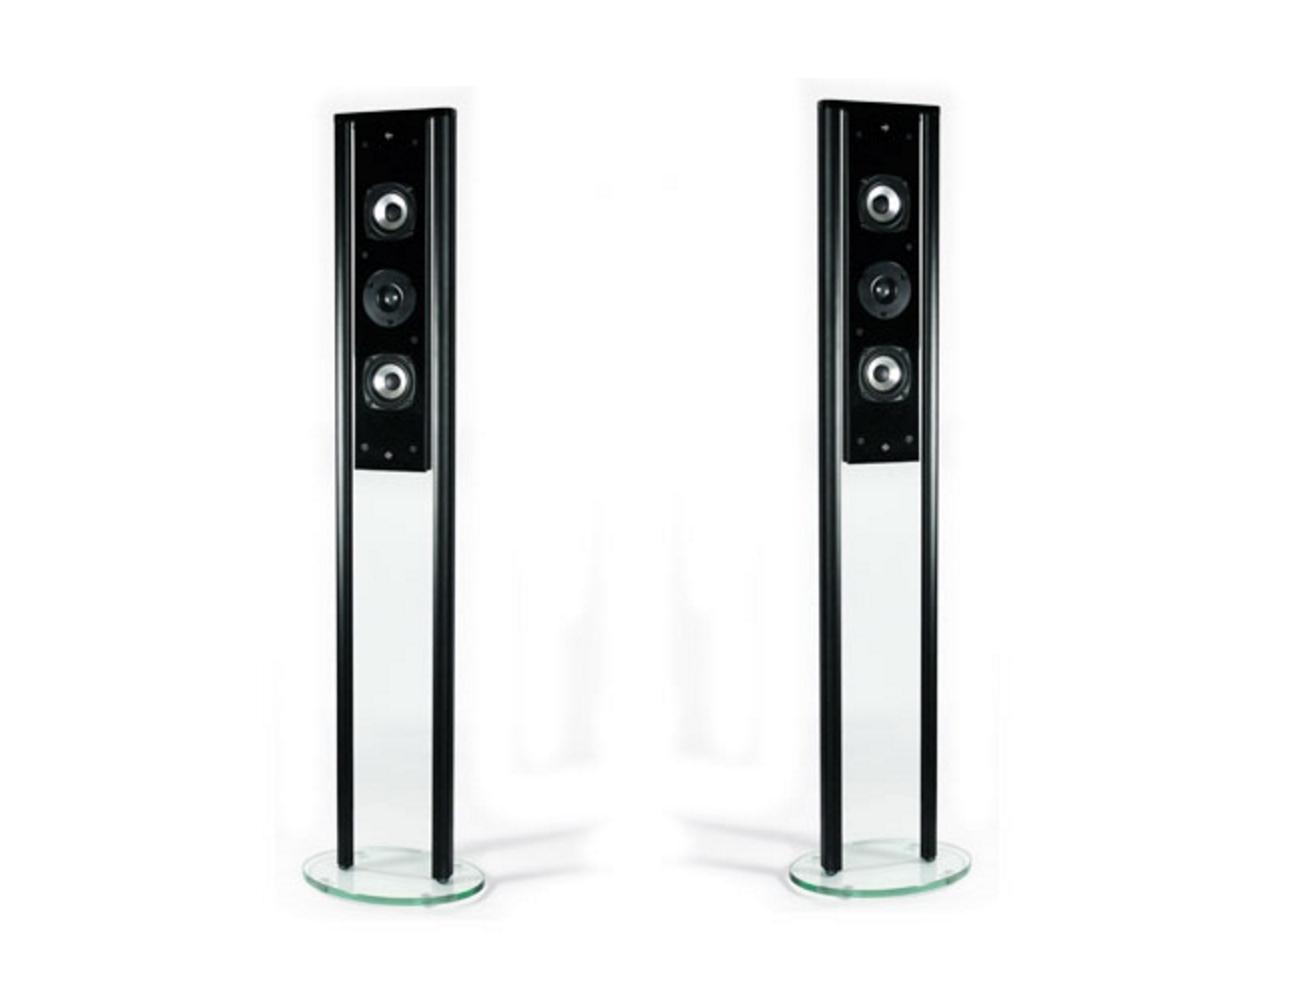 teufel 7537 mo 6 fr lautsprecher aus motiv 6 glas s ulen speaker paar ebay. Black Bedroom Furniture Sets. Home Design Ideas